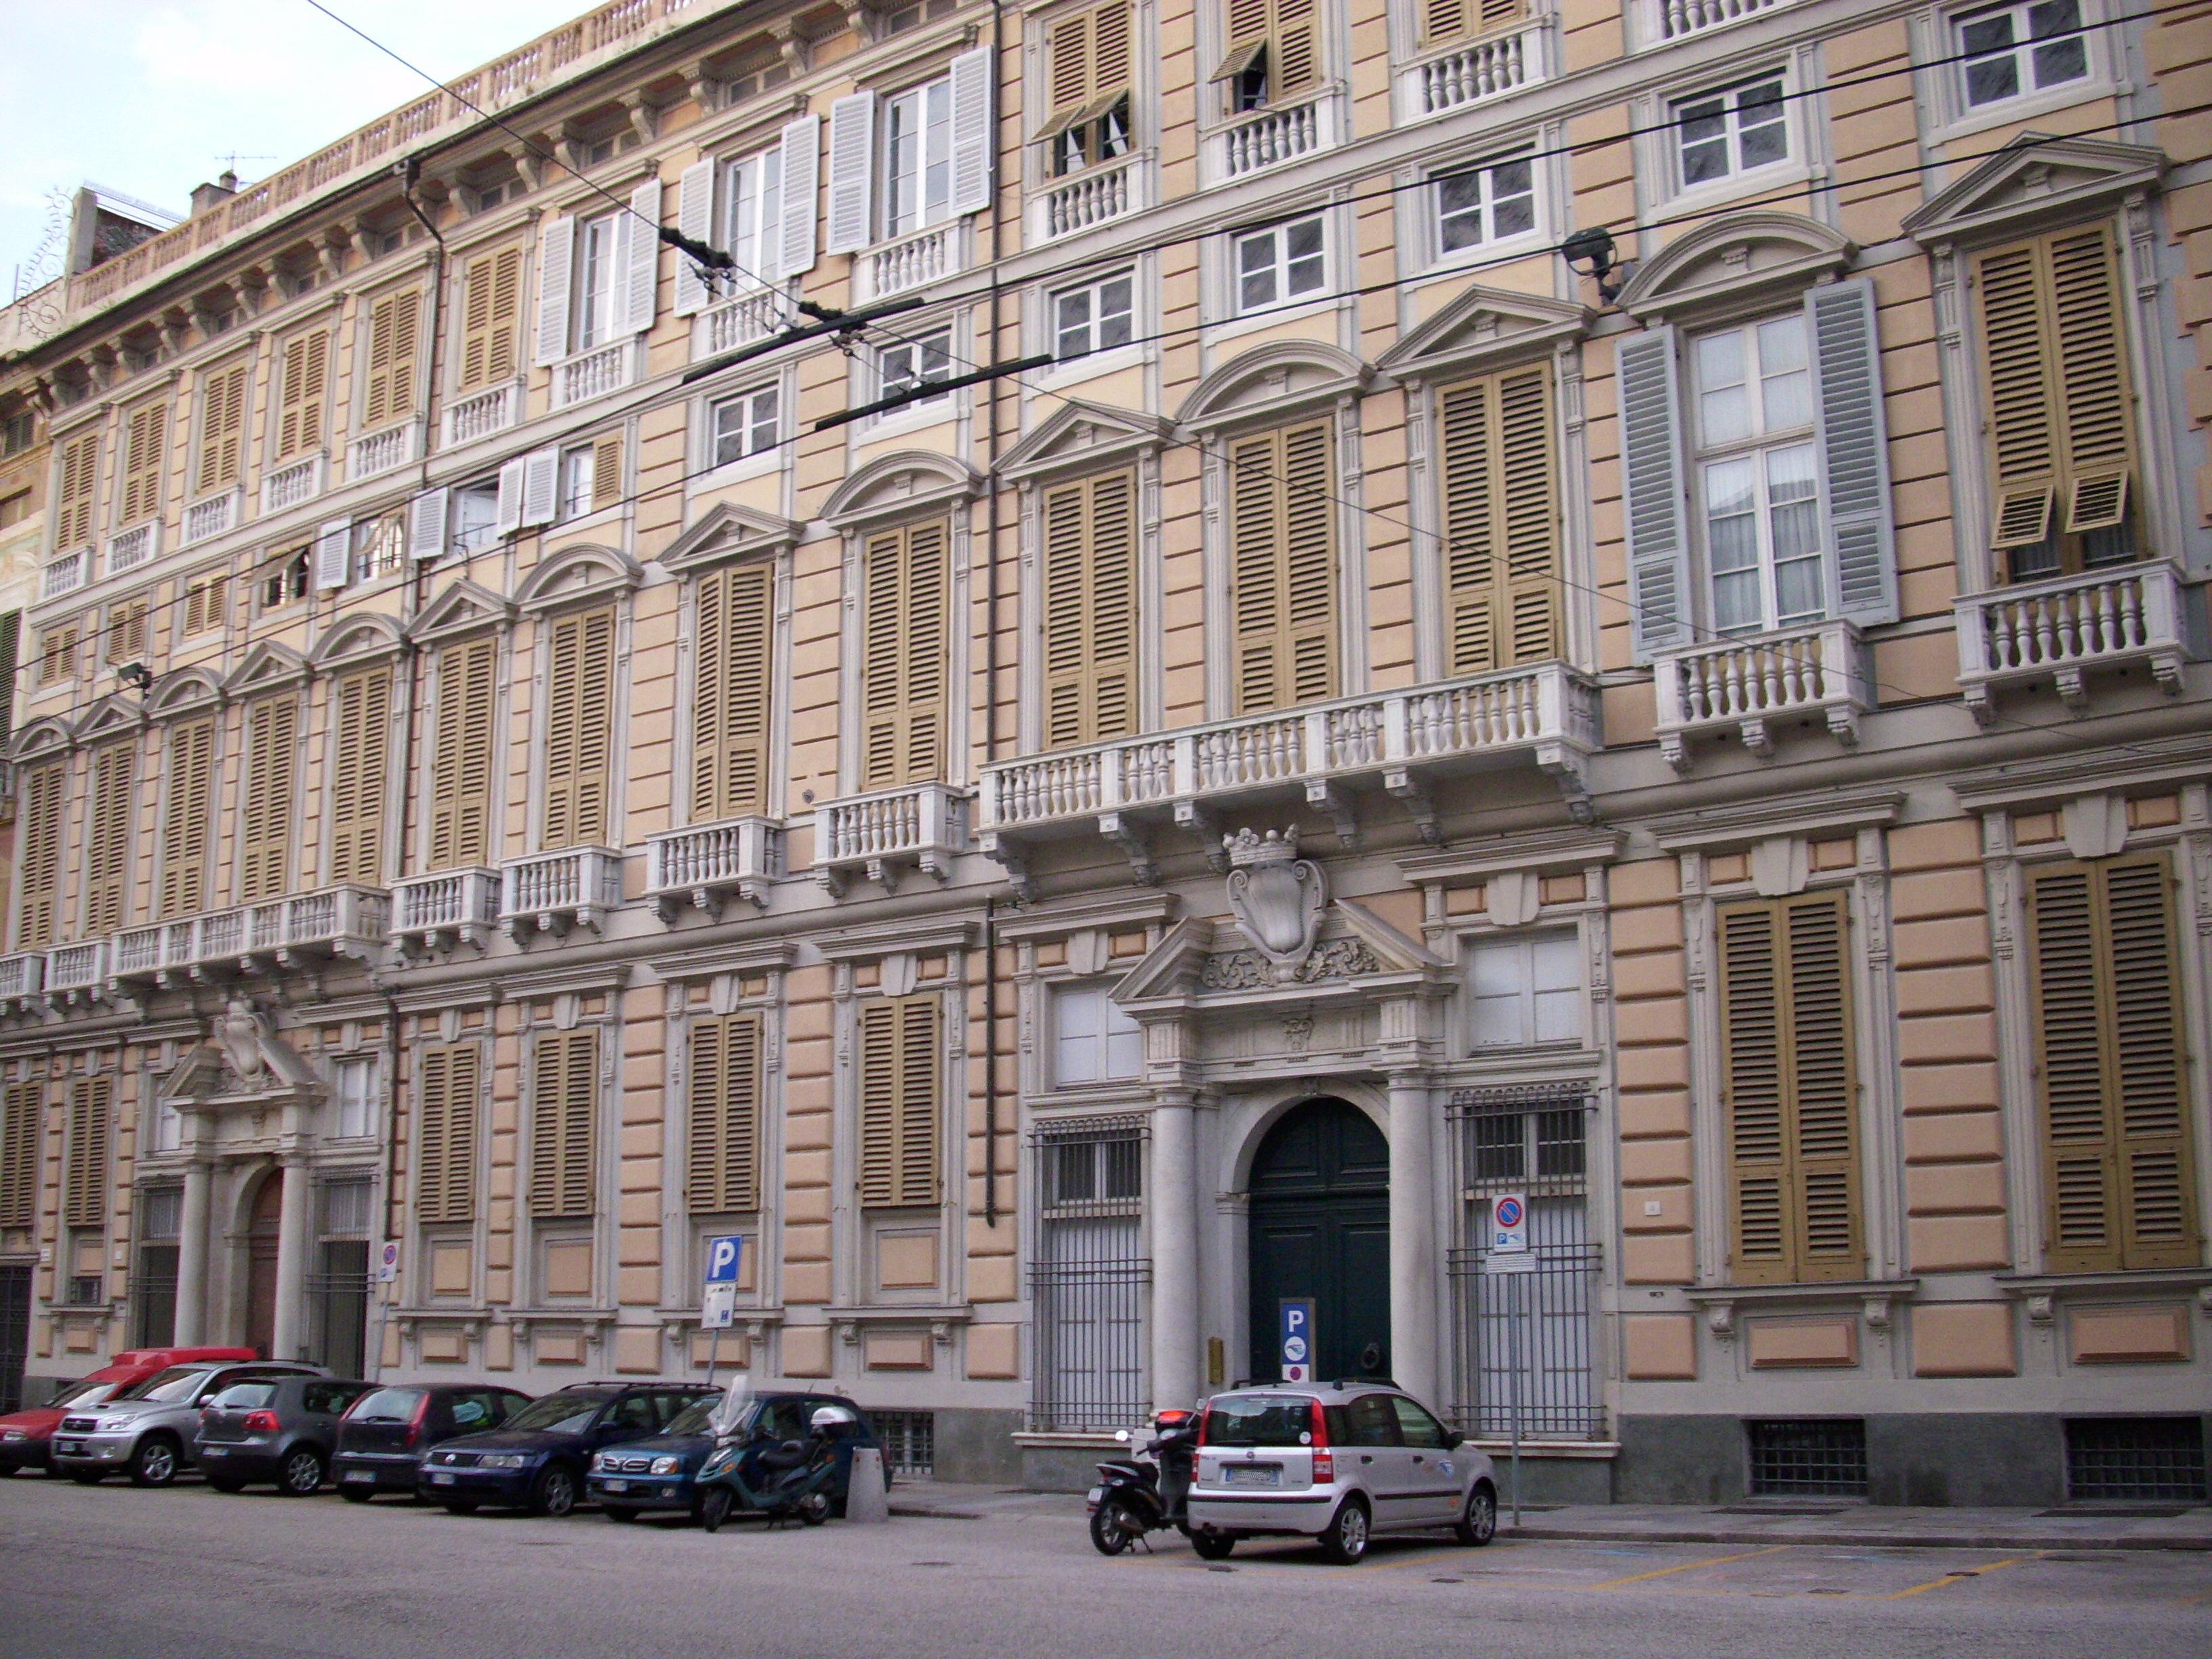 Palazzo Negrone Genova 01 Palazzo Negrone Genova 01